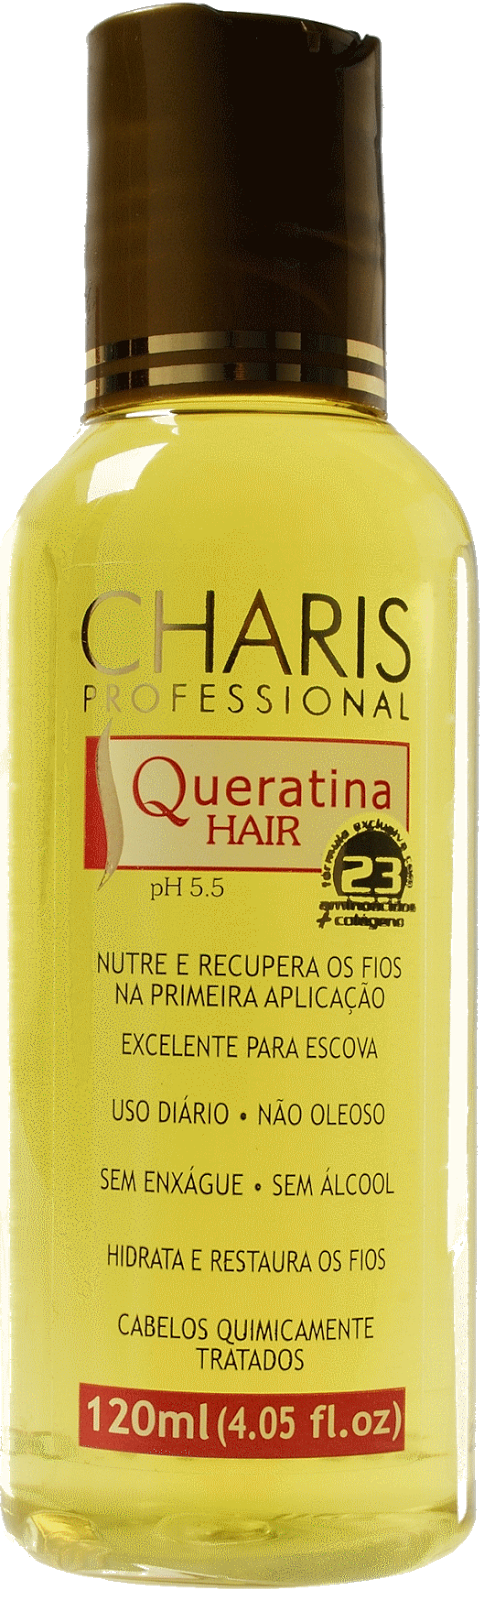 Queratina Charis Professional - Tratamento para repor a Queratina perdida dos cabelos.